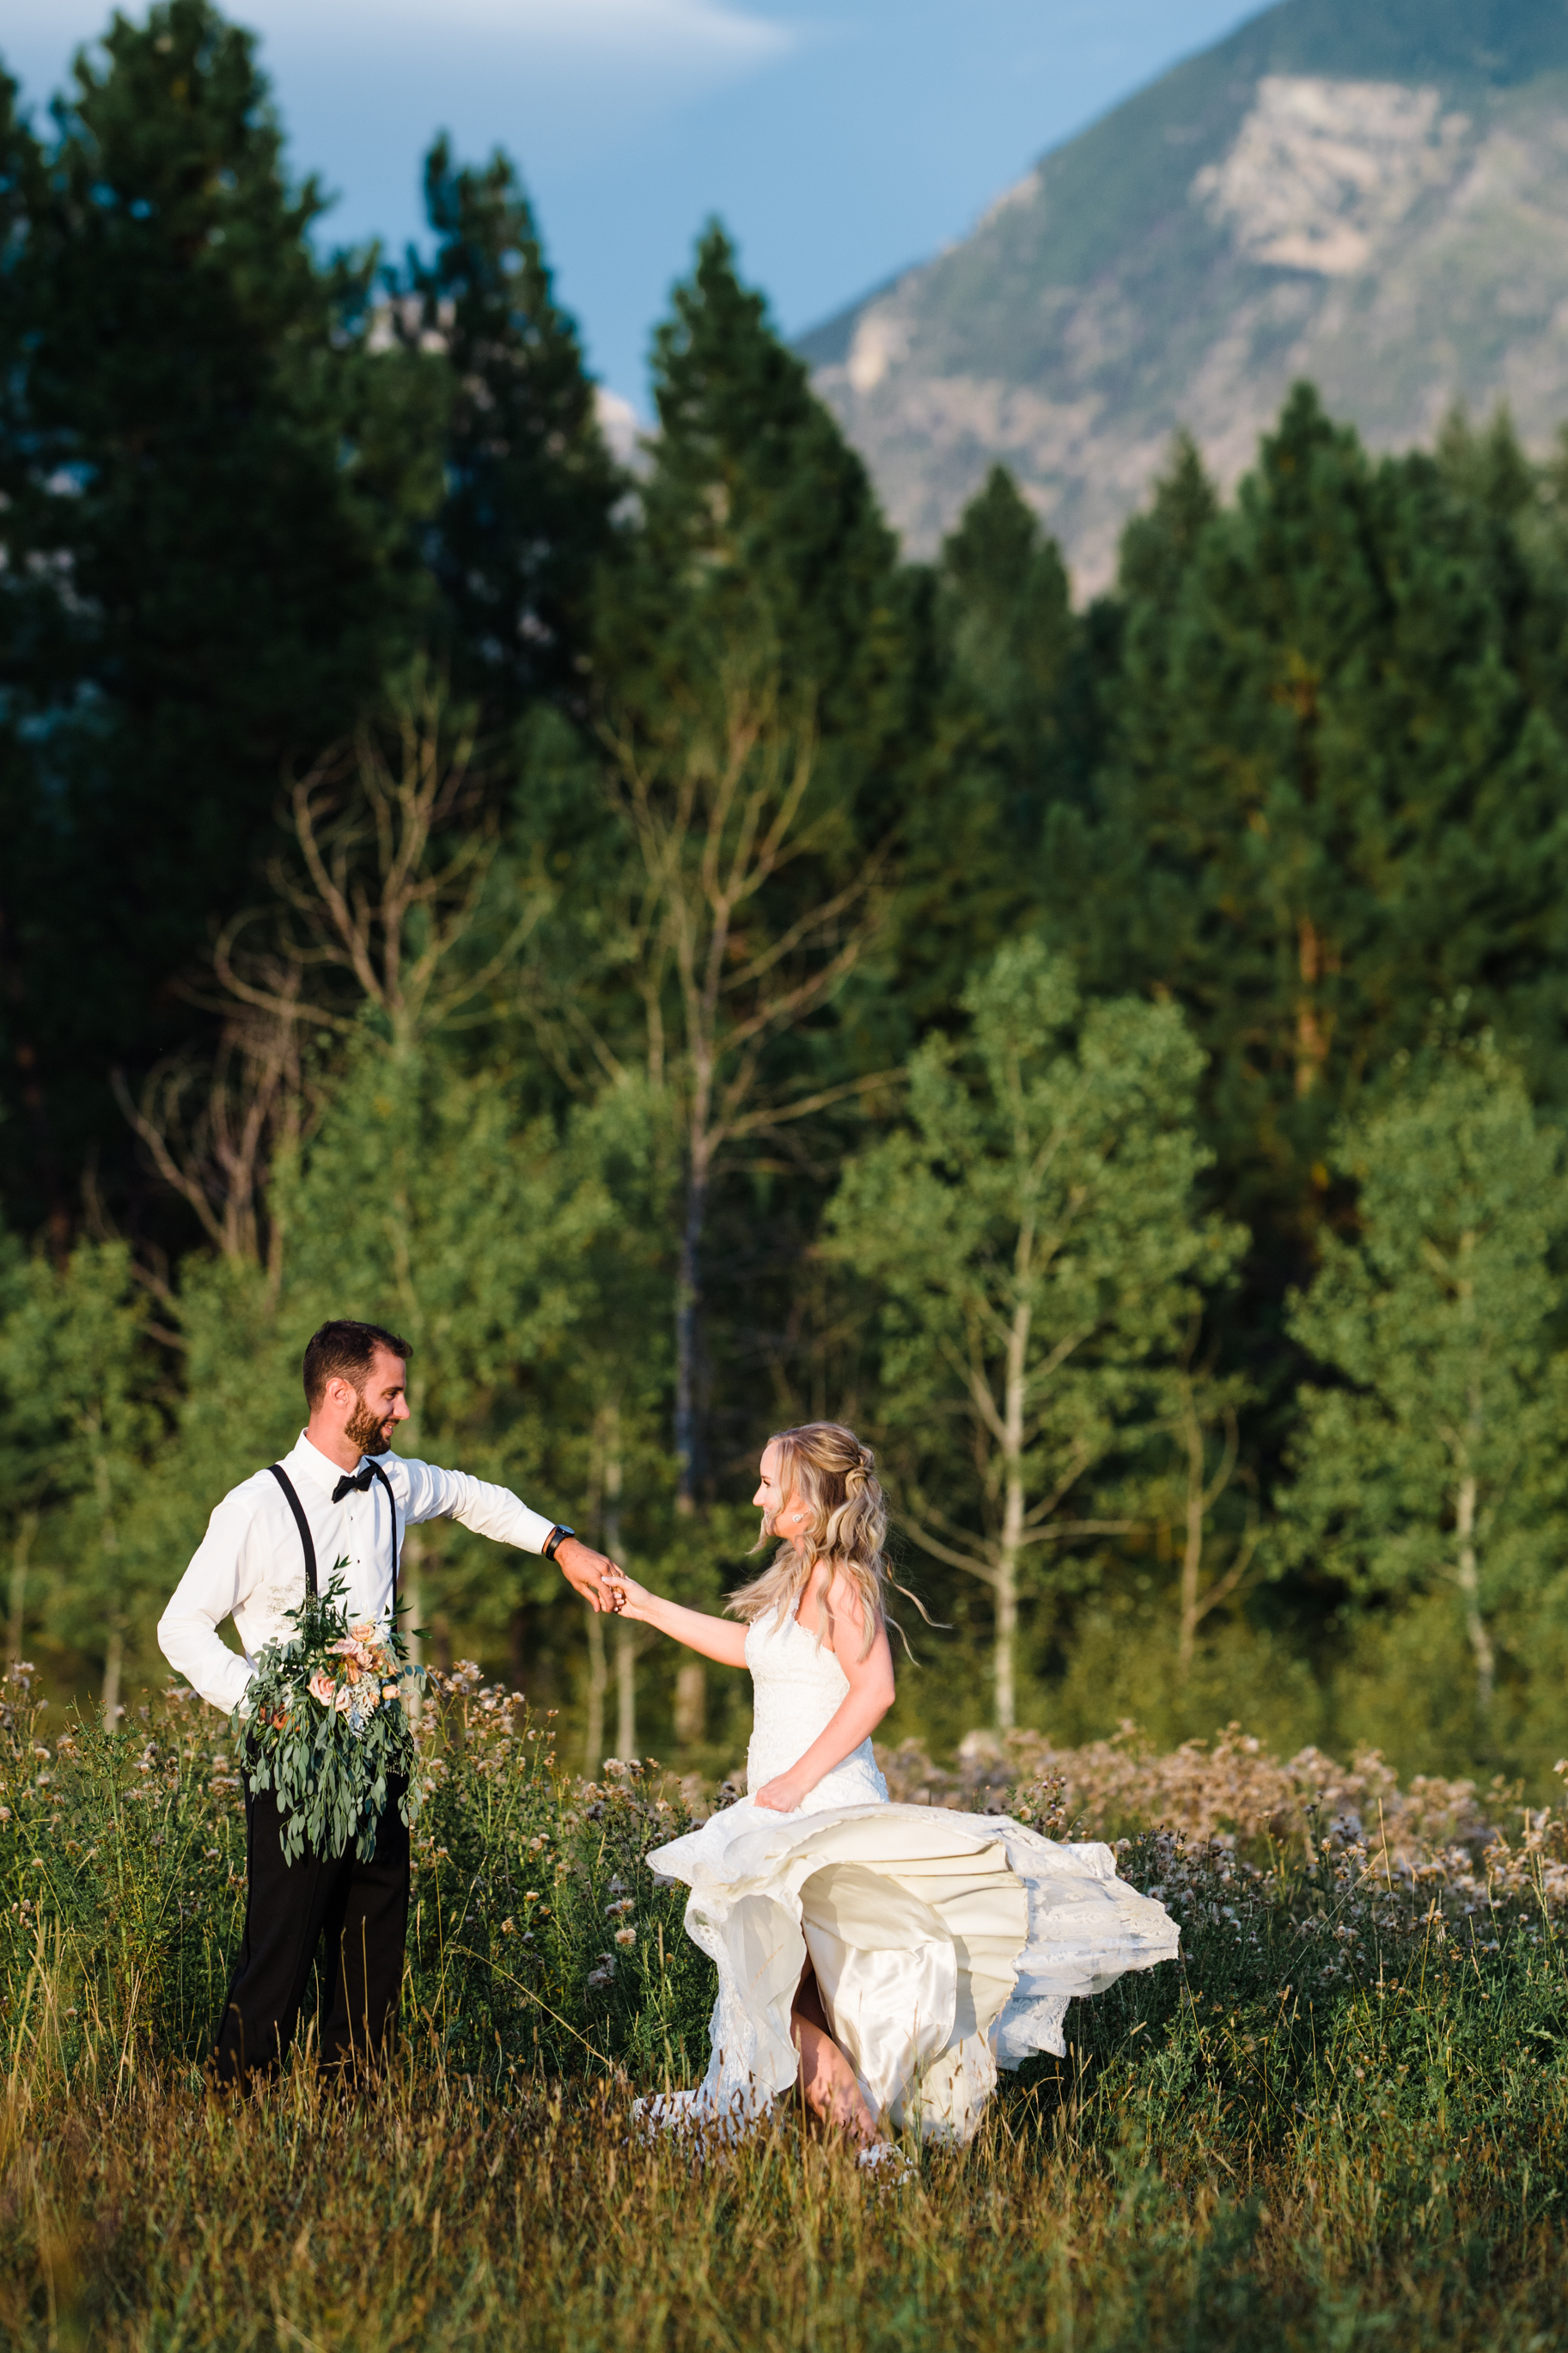 051Sky Ridge Ranch Wedding_Montana Wedding Photographer_Jessica & Brian_Honeybee Weddings_August 24, 2019-32.jpg